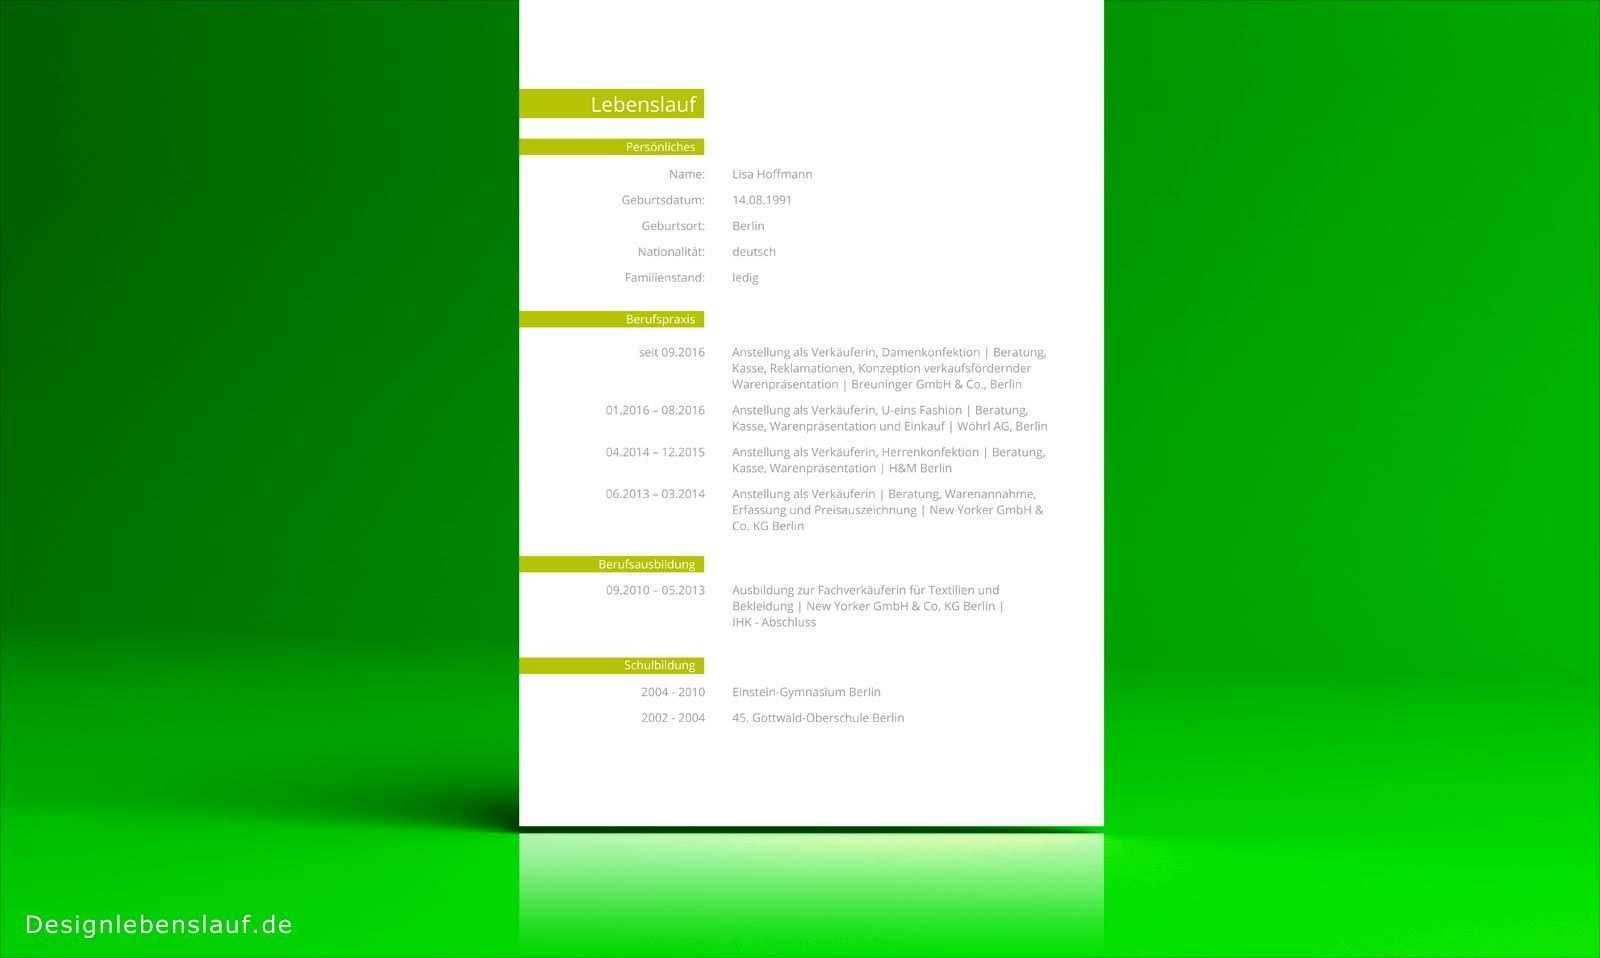 Lebenslauf Vorlage Word Open Office Zum Herunterladen Word Lebenslauf Vorlage Office Layout Herunterl In 2020 Invitation Template Invitation Maker Invitation Cards